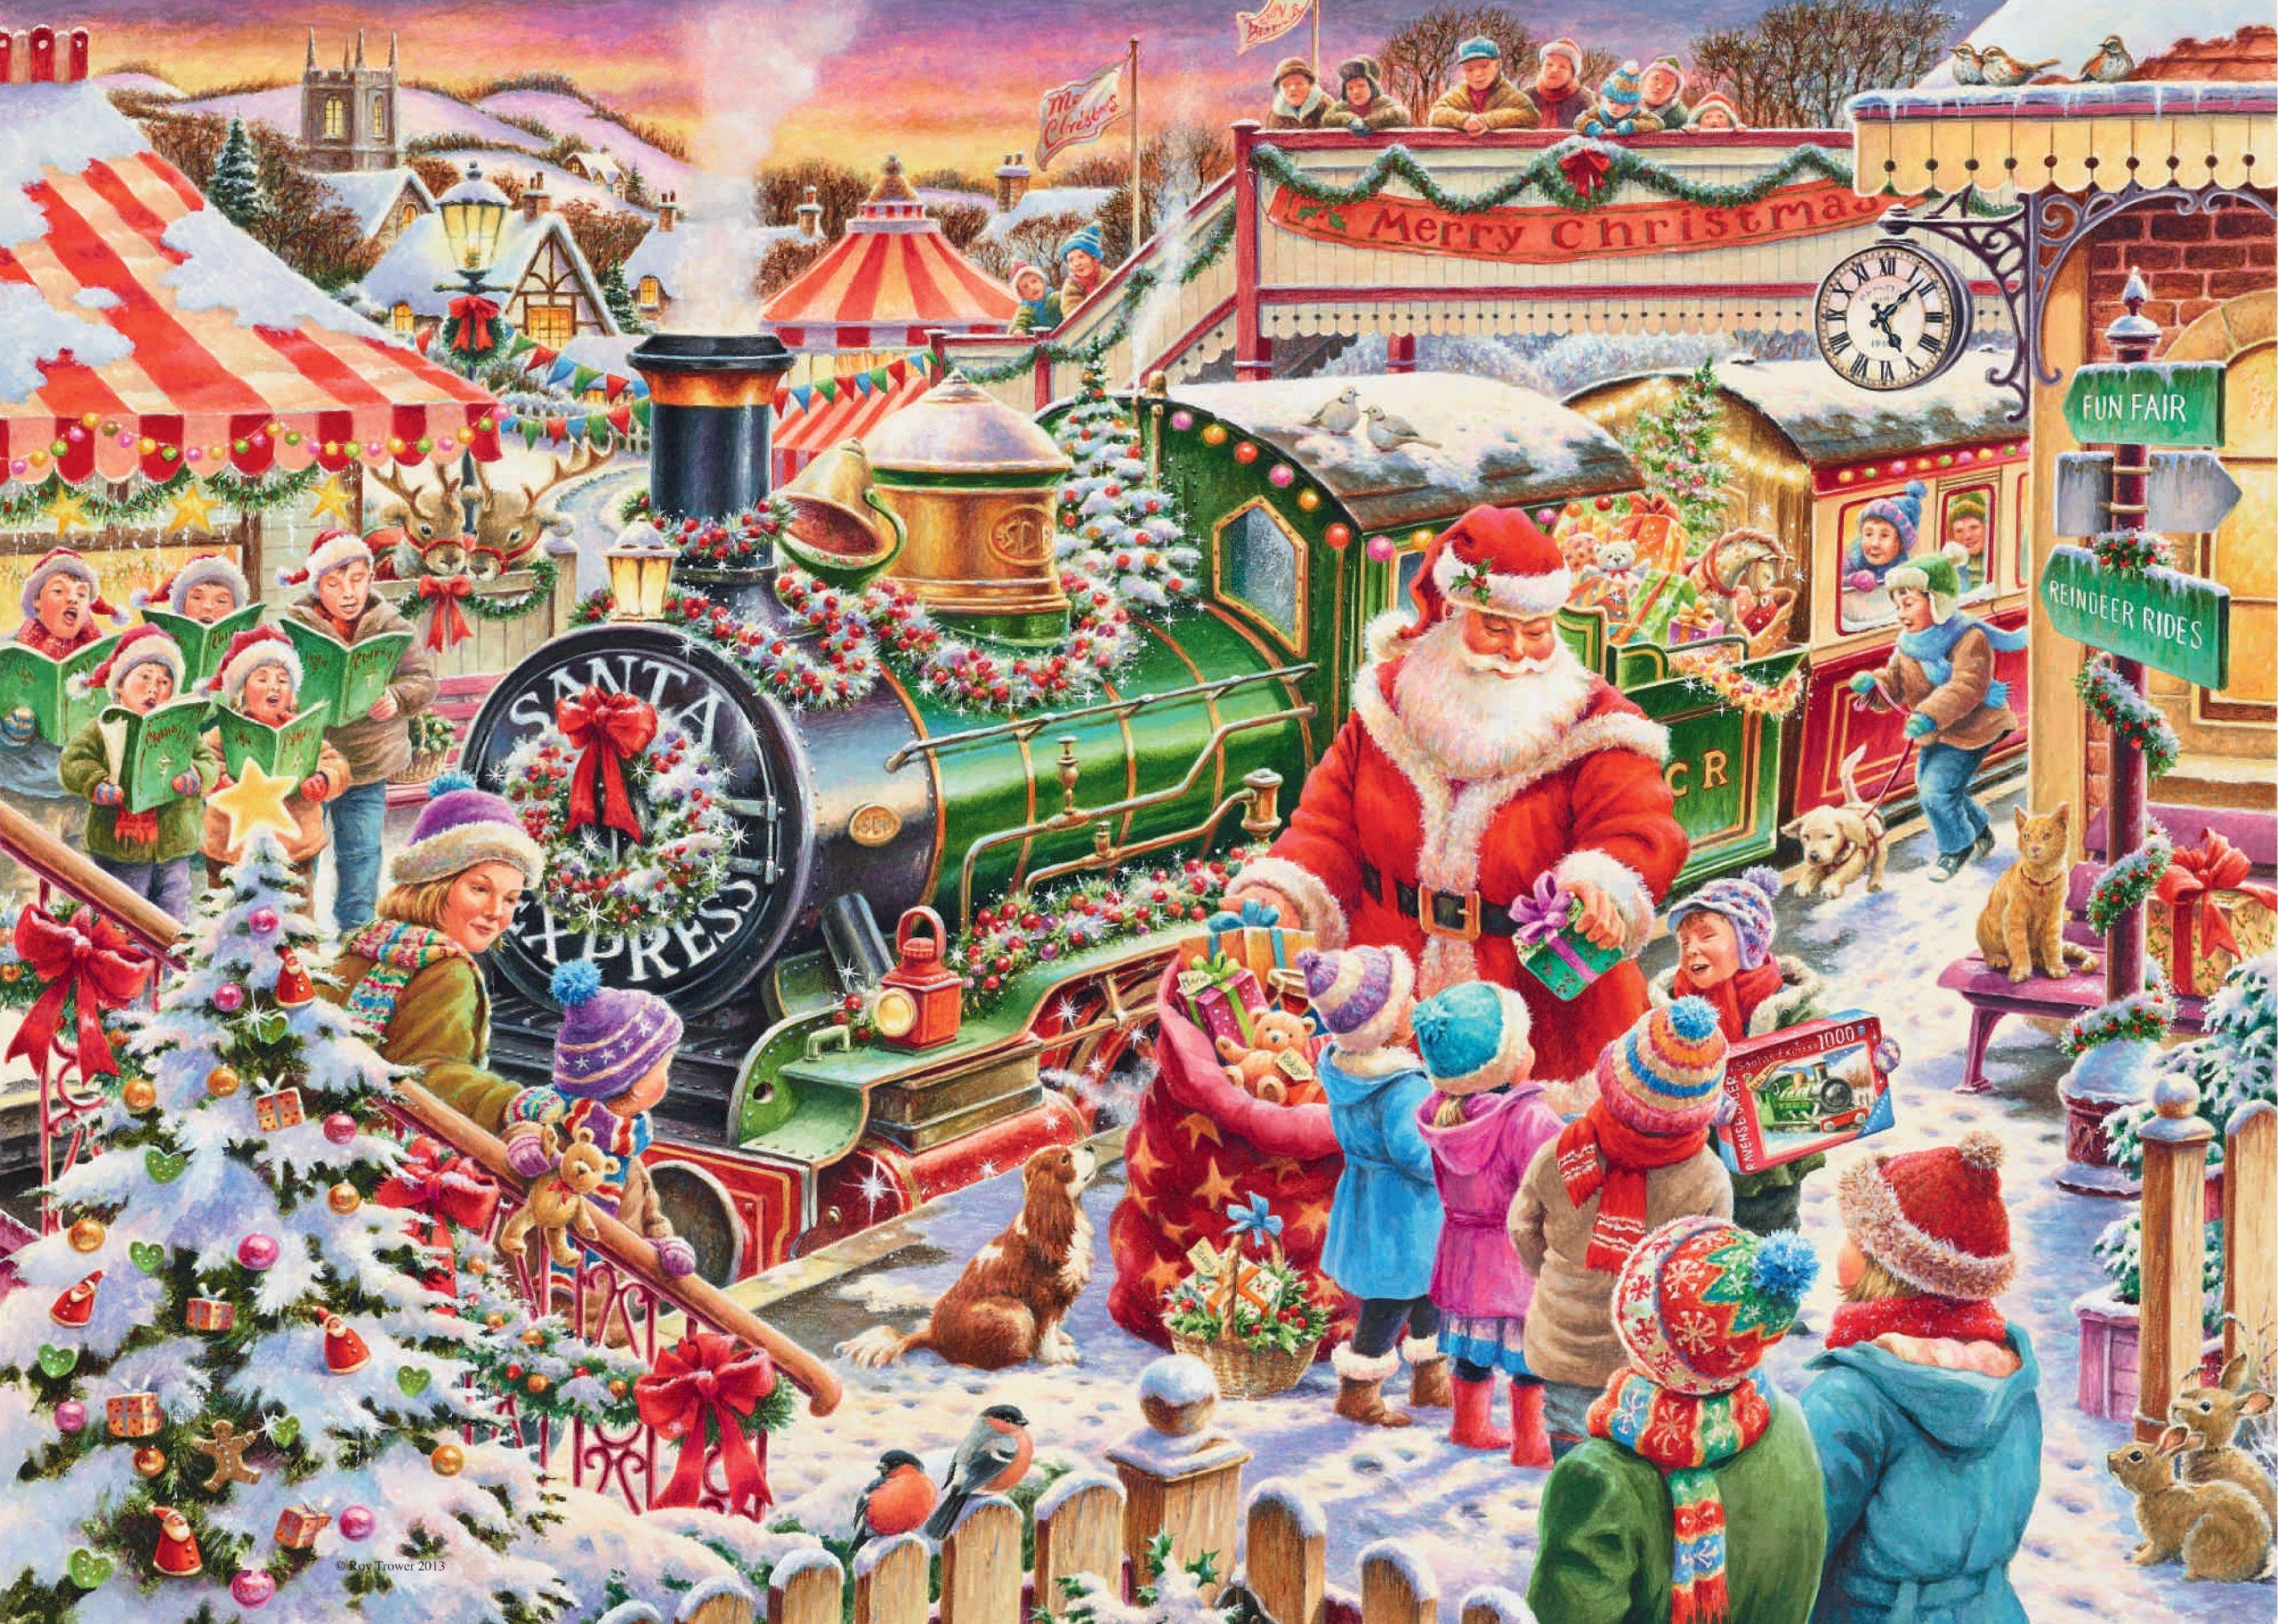 ravensburger christmas puzzle 2013 - Ravensburger Christmas Puzzles